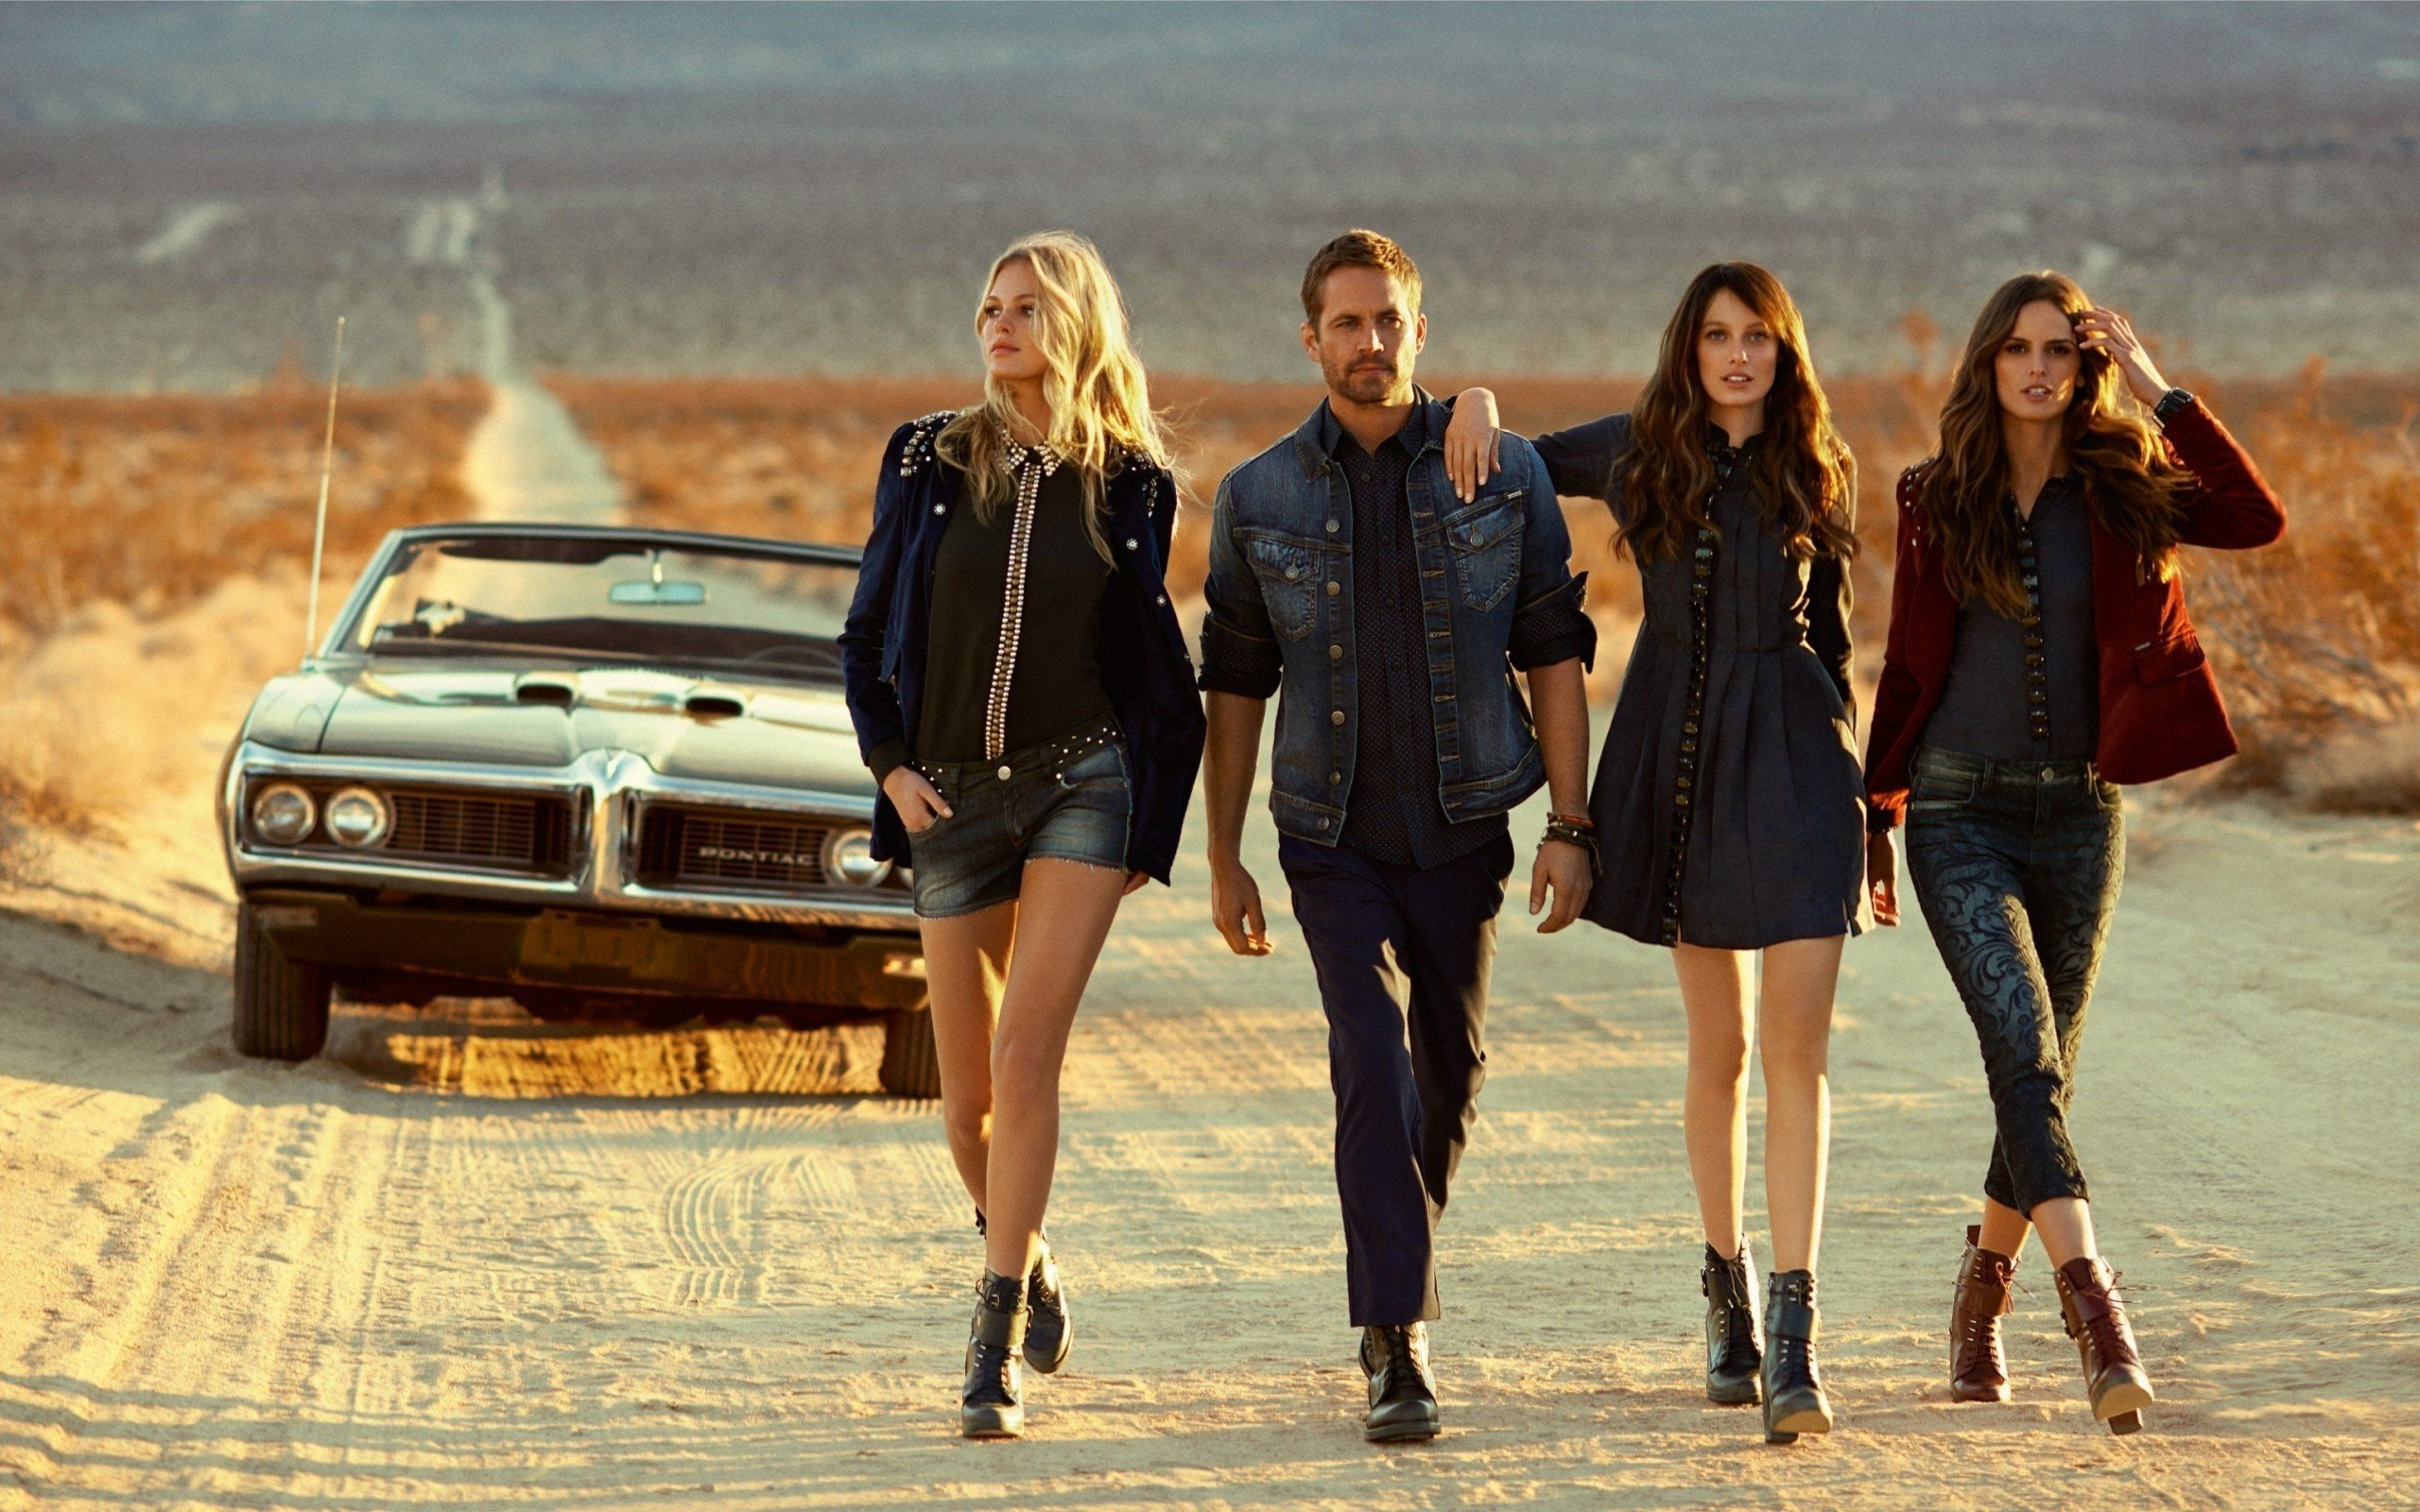 Paul Walker Furious 7 Car Movies Hd Wallpapers Desktop And Mobile Images Photos